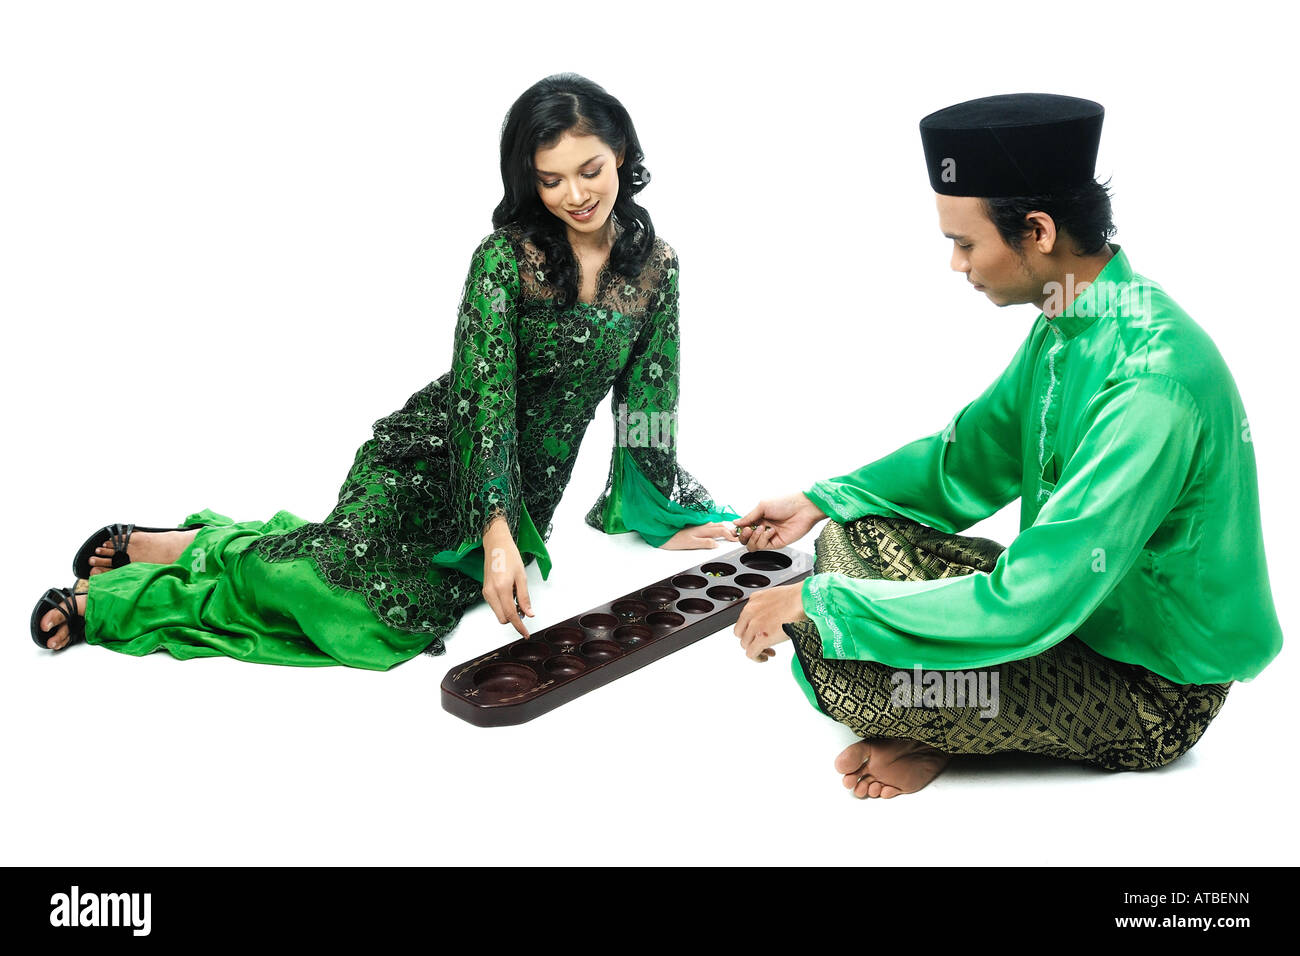 Malaysian Couple Play Congkak Stock Photo: 16265120 - Alamy